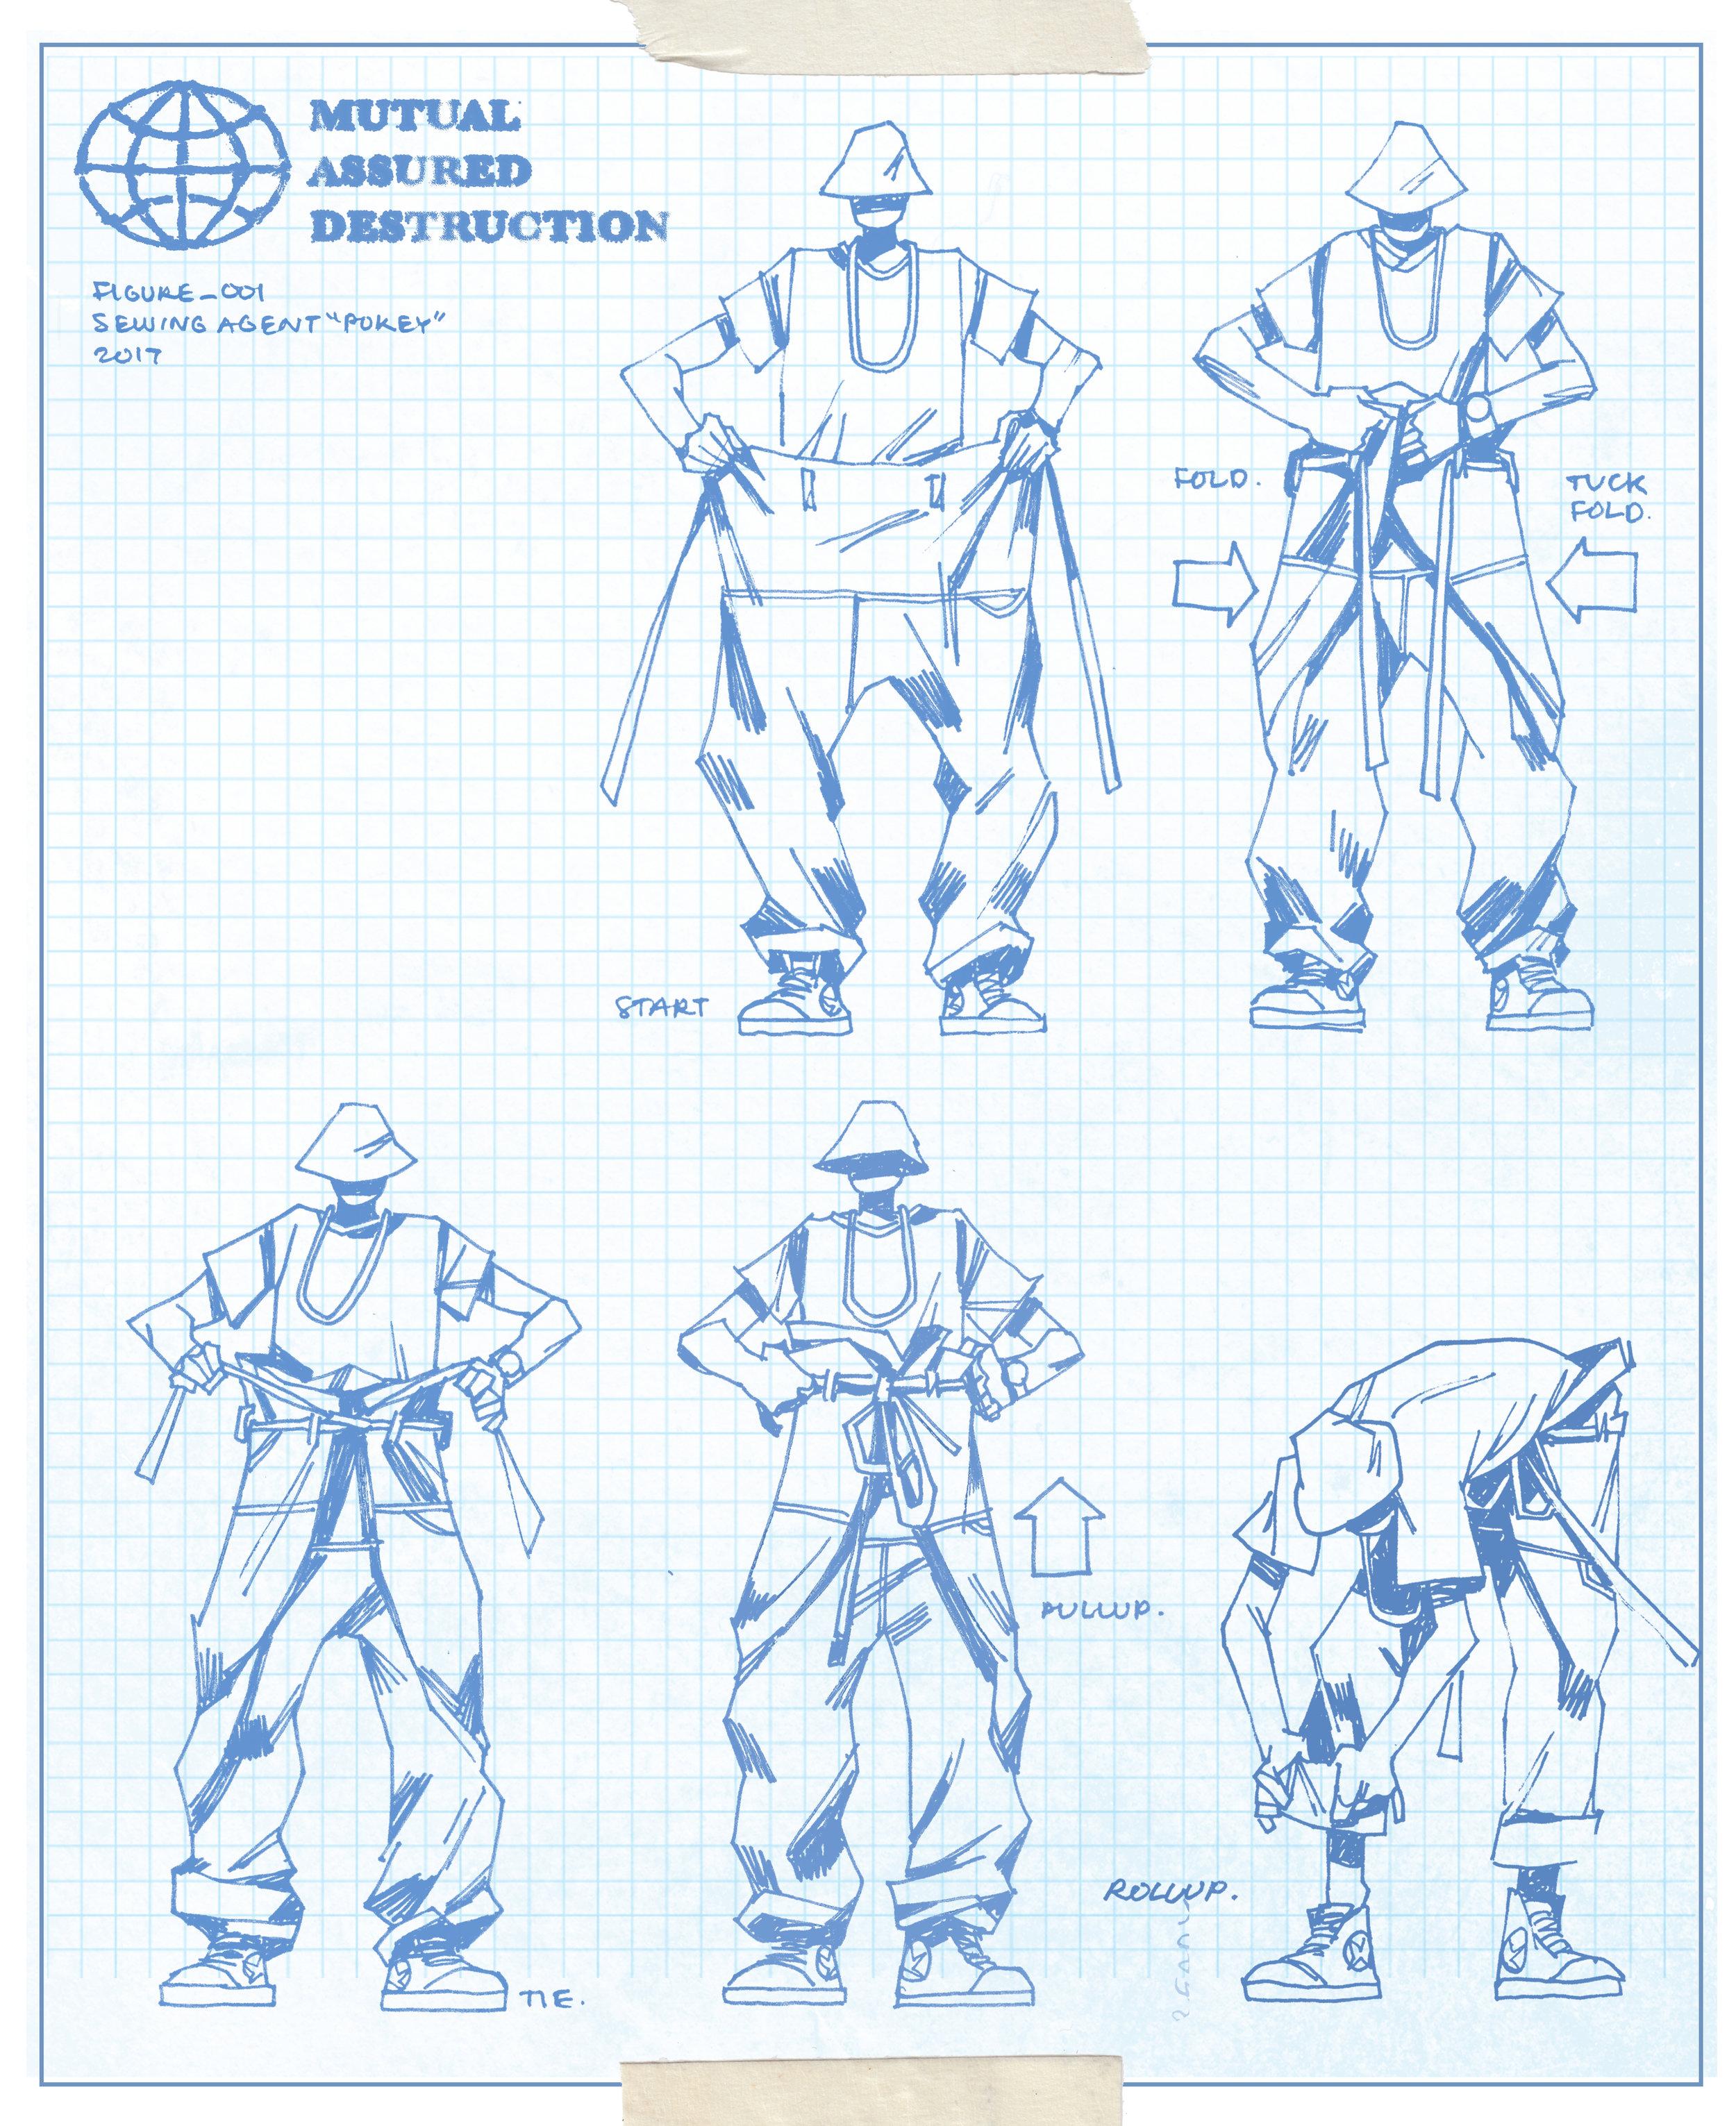 M.A.D Handbook Config.001